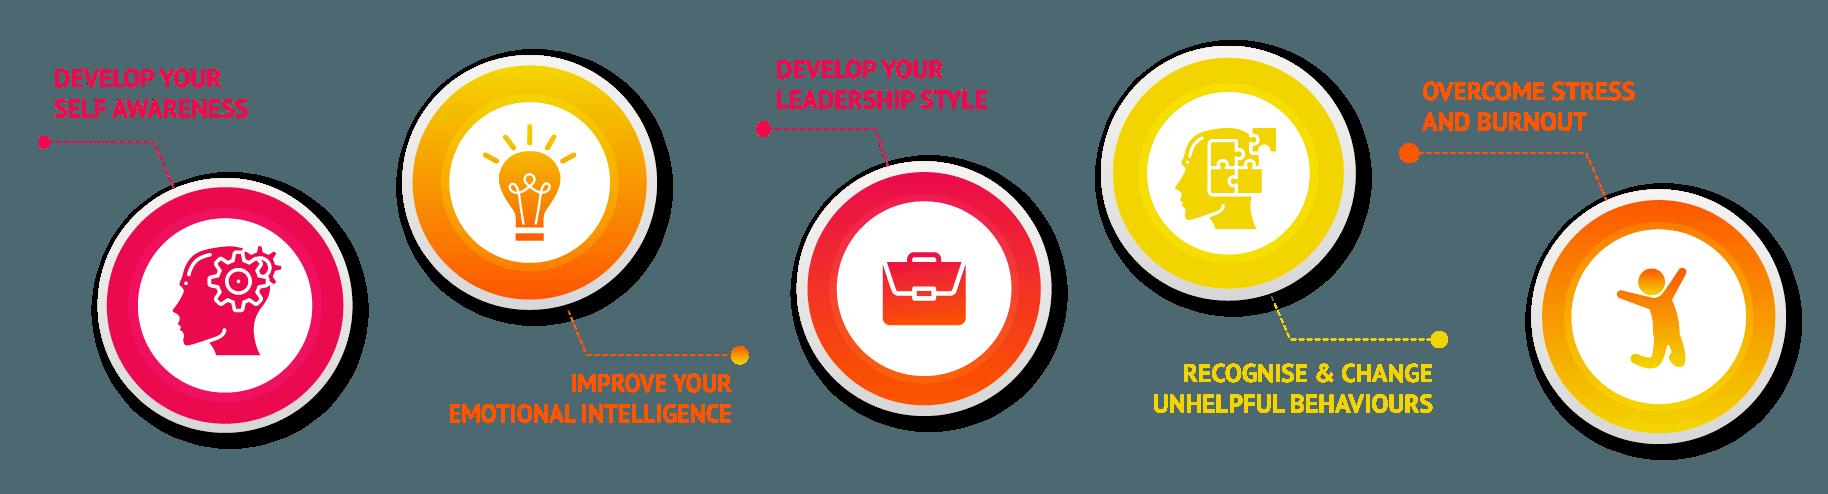 Website Coaching and Enneagram Infographic - Executive Coaching & Life Coaching